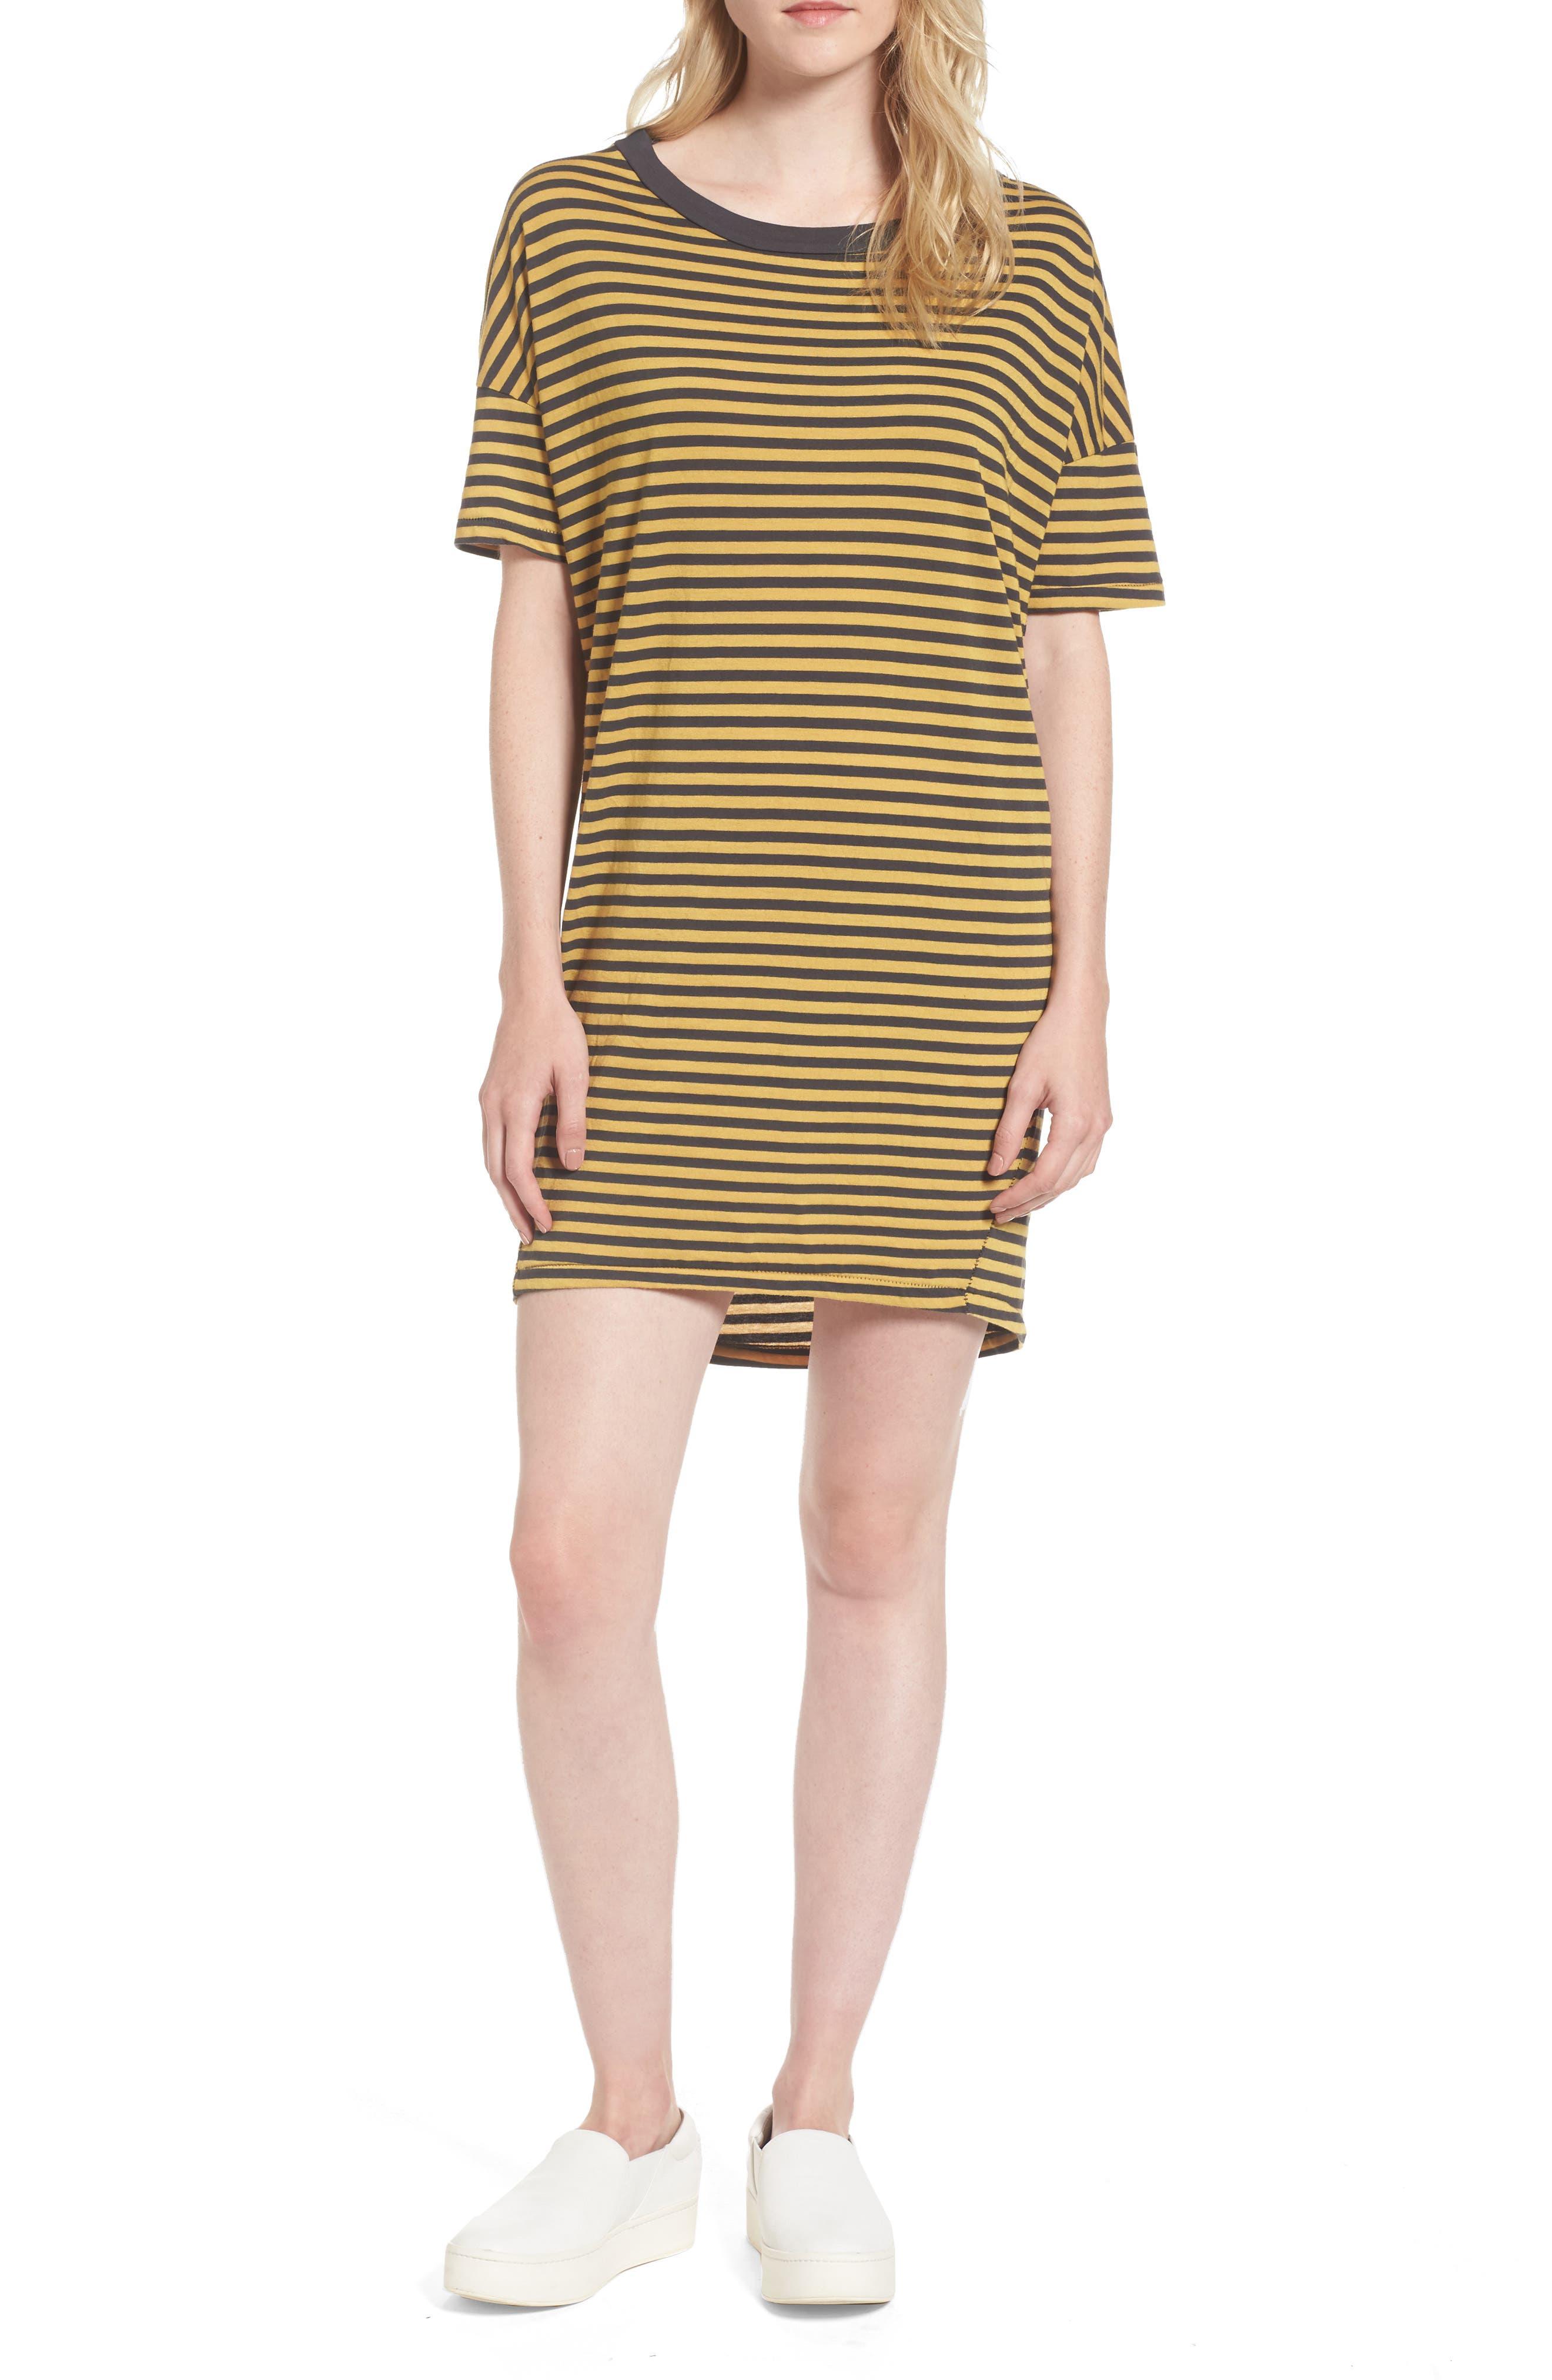 Main Image - Stateside Mustard Stripe T-Shirt Dress